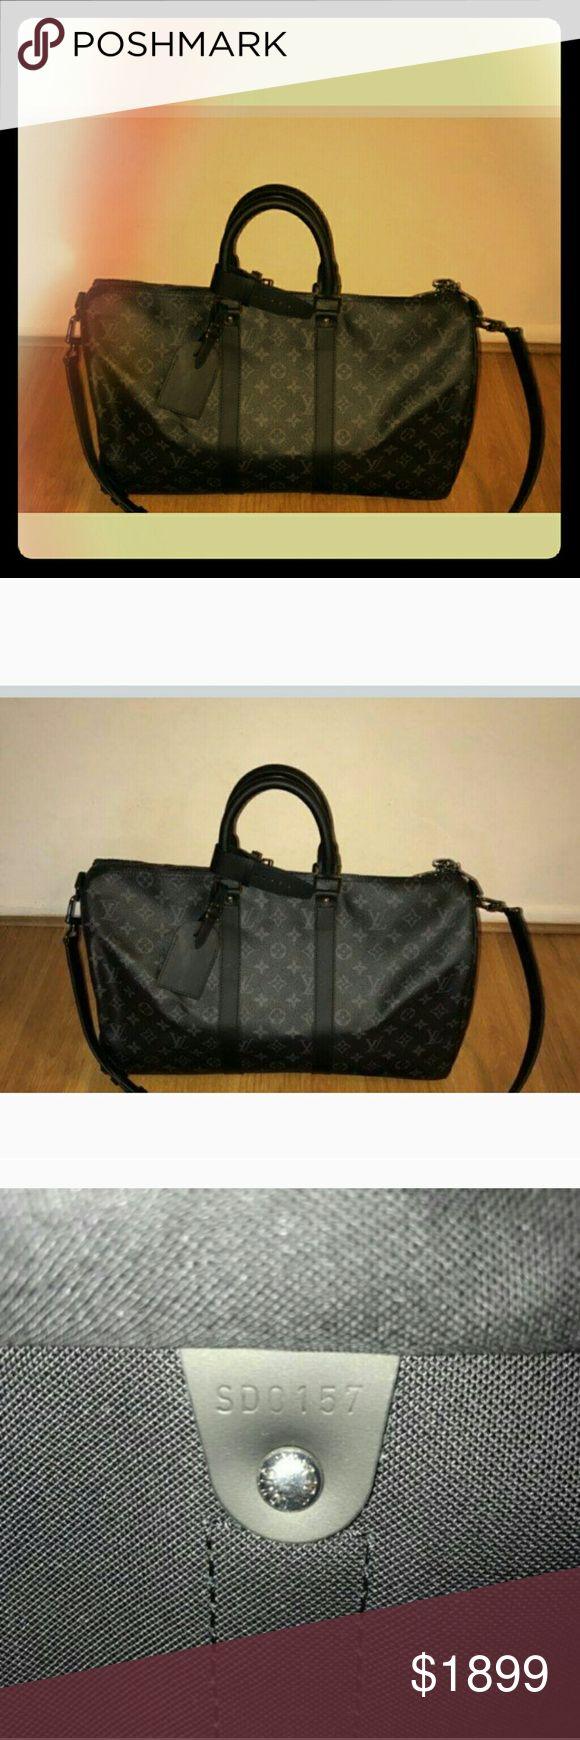 Nwt louis vuitton keepall 45 Brand new Louis Vuitton Keepall Monogram Eclipse size 45 Dated 2017 Louis Vuitton Bags Travel Bags